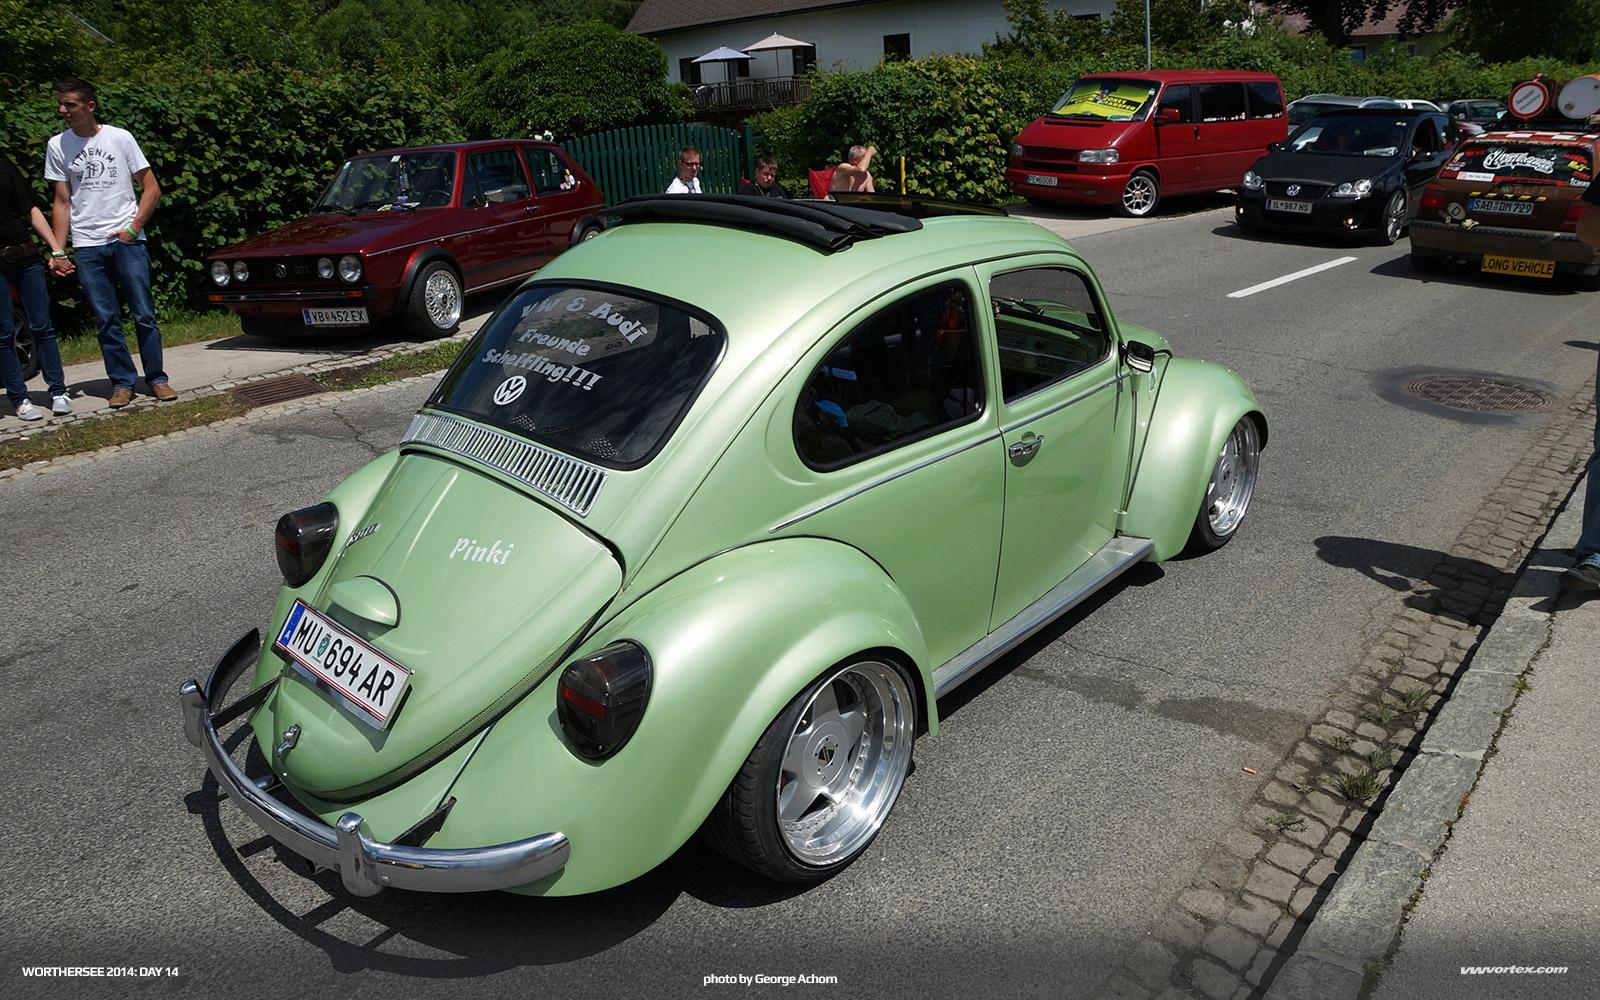 Images volkswagen coccinelle fender volkswagen coccinelle fender en -  Fenders For My Beetle Http Www Vwvortex Com Wp Content Uploads 2014 06 2014 Worthersee Day 14 Vwvortex 931 Jpg